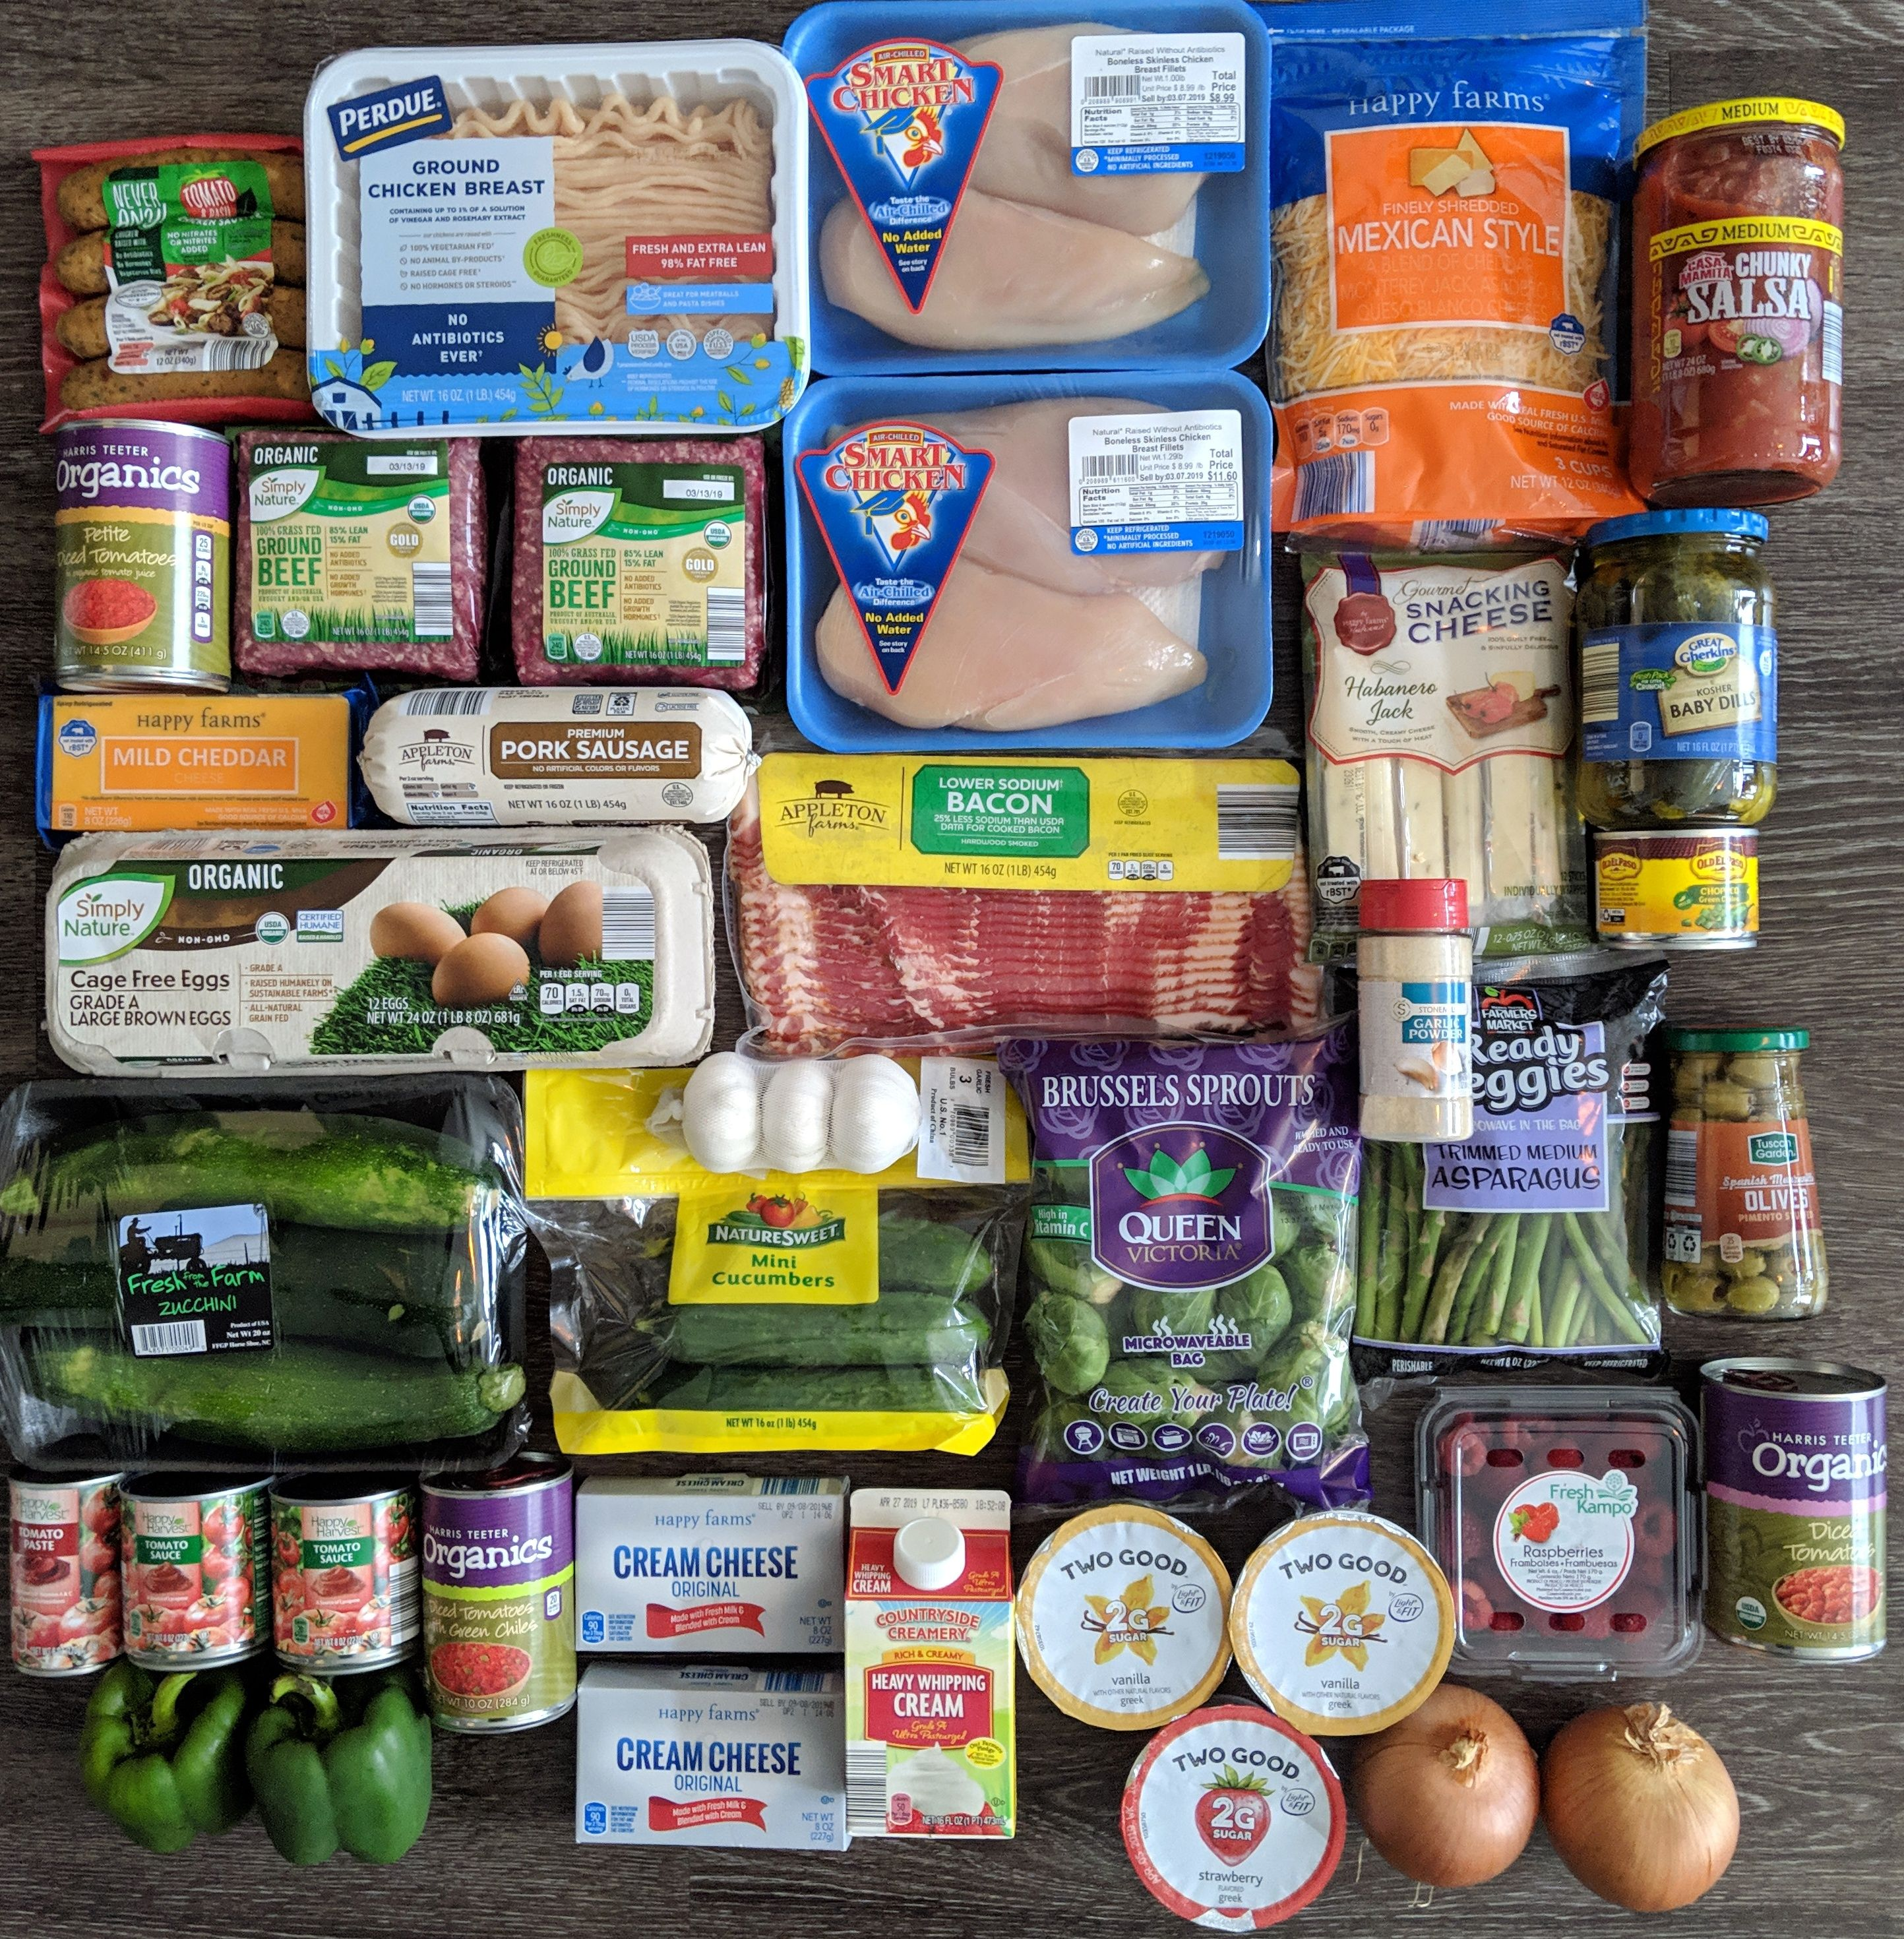 Aldi Harris Teeter Grocery Haul Grocery Haul Healthy